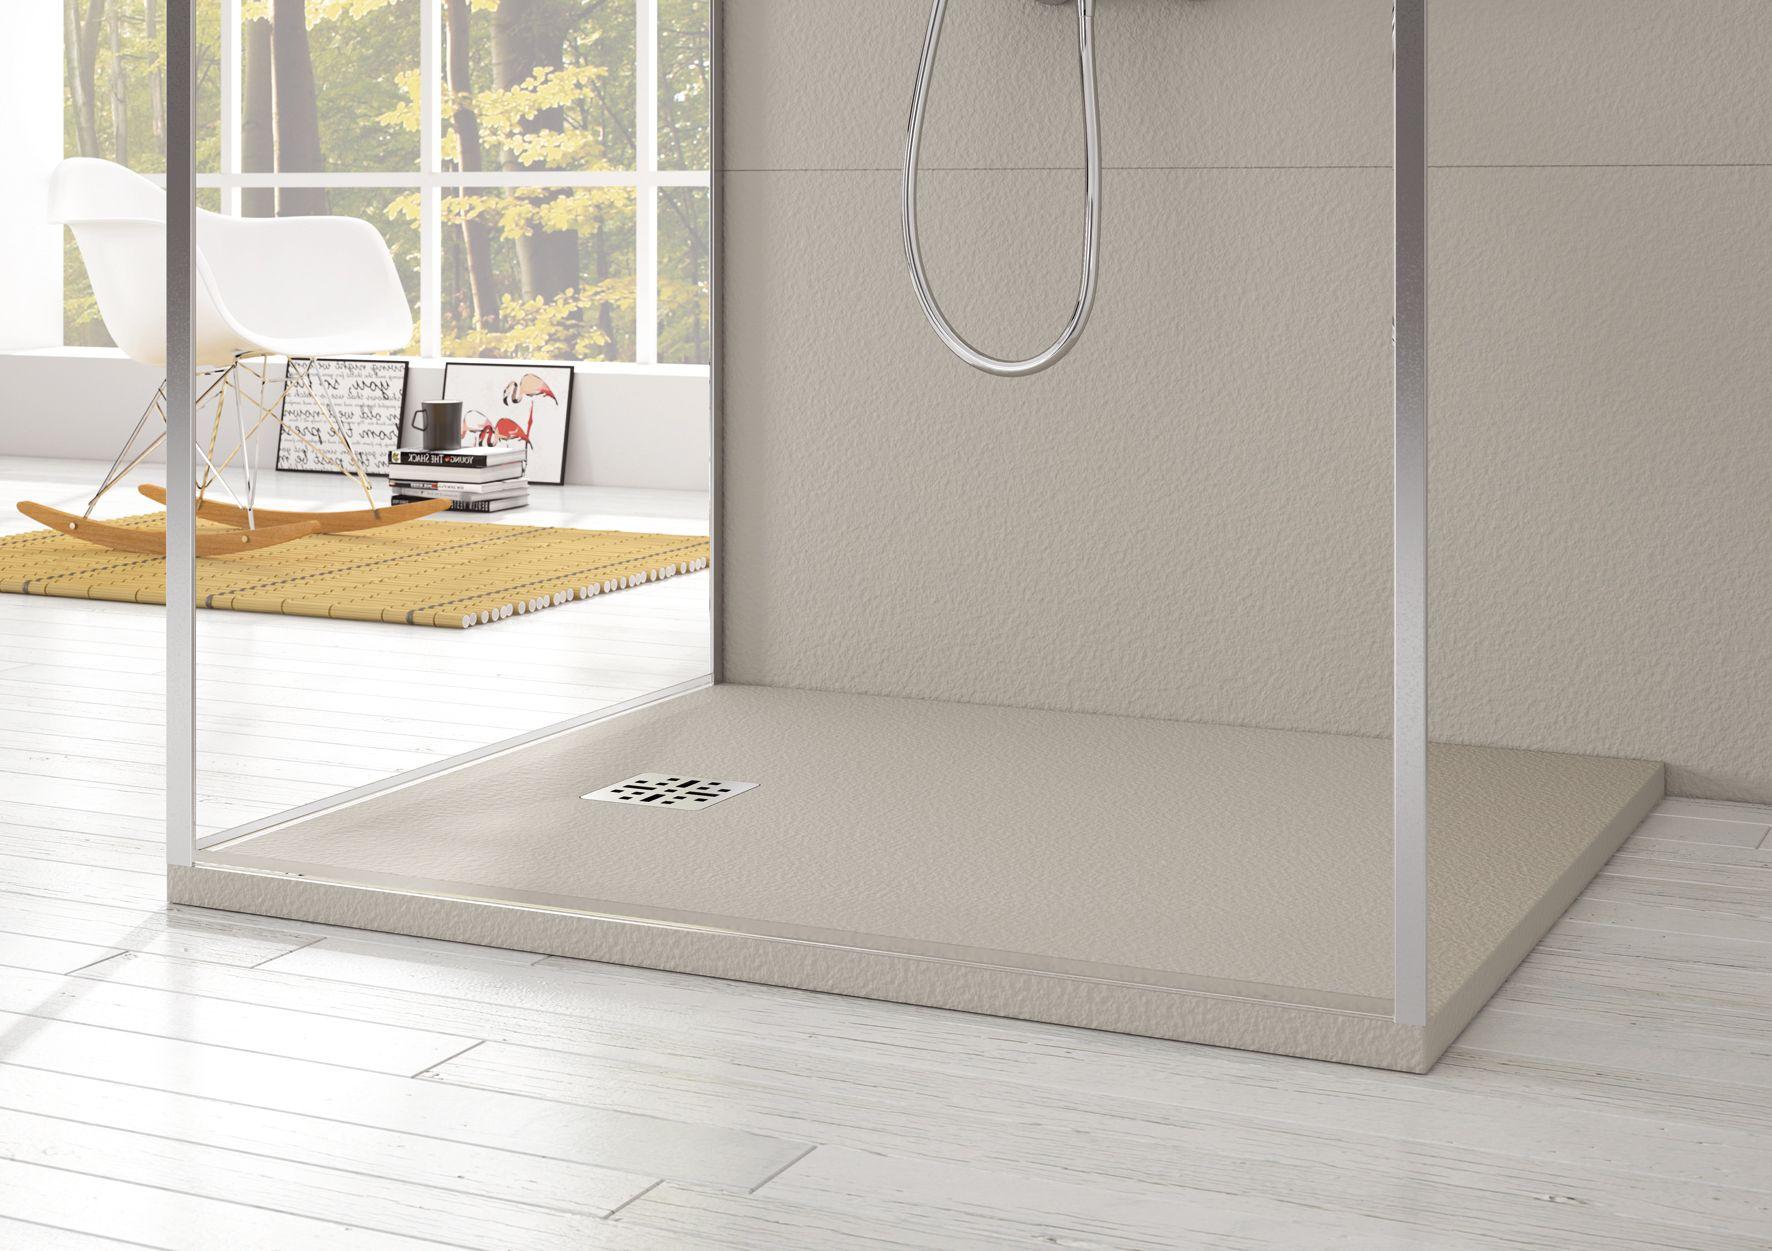 receveur de douche cedam saba receveur couleur pierre sable en mineralsolid disponible en 4. Black Bedroom Furniture Sets. Home Design Ideas